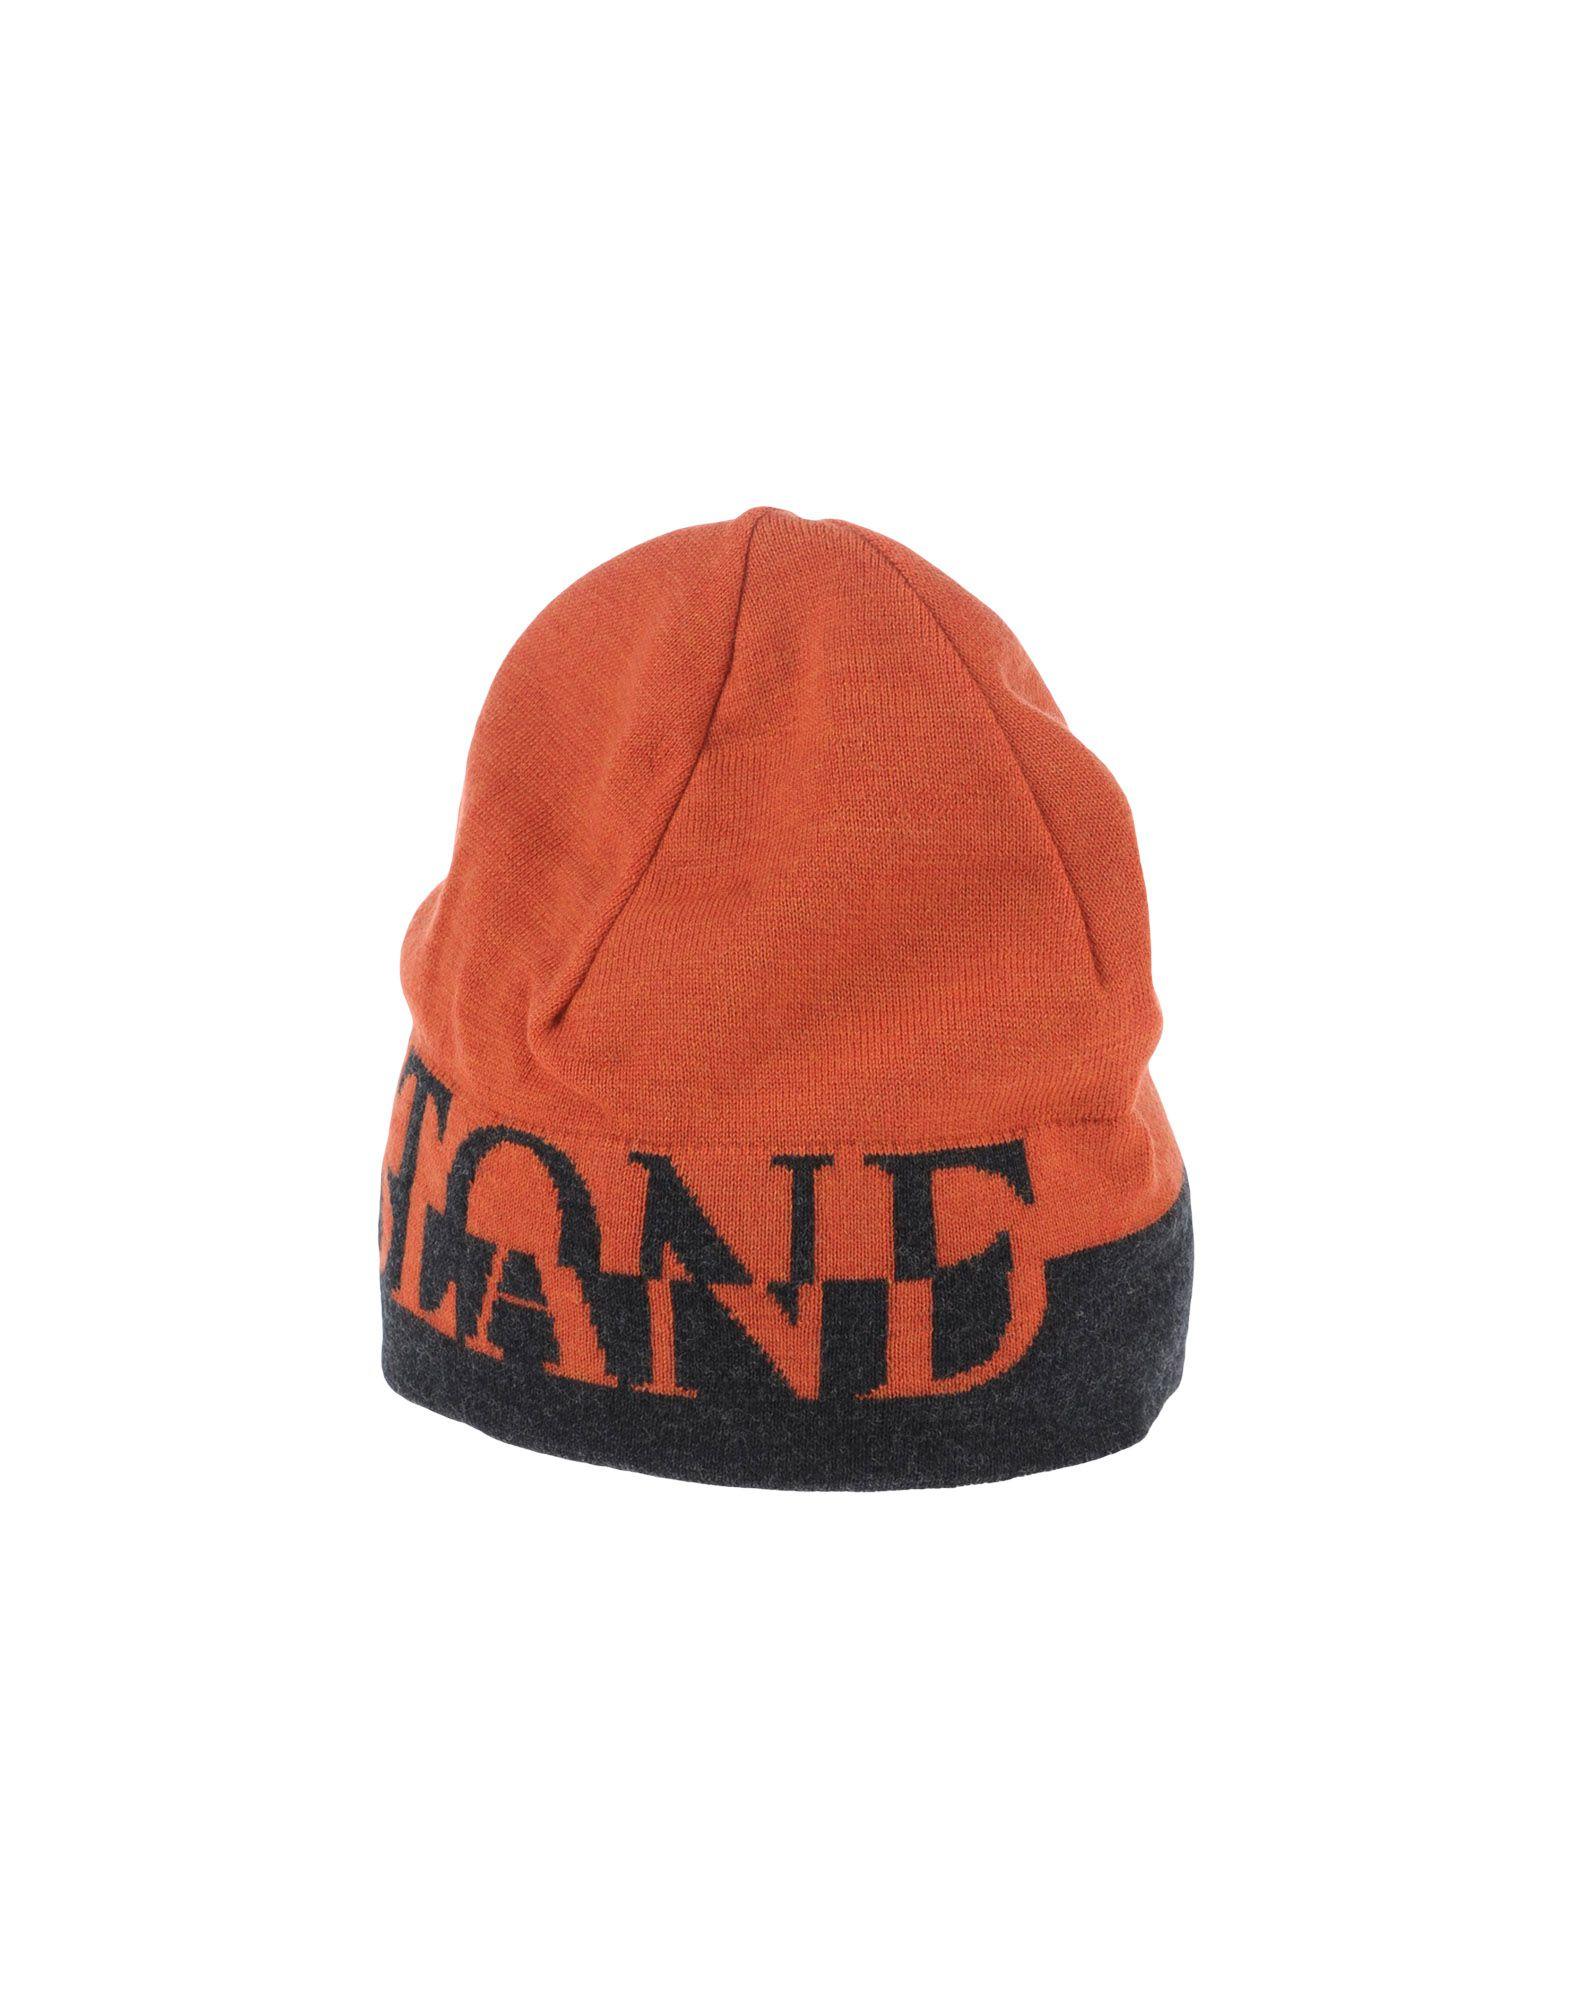 Stone island Hat in Orange for Men - Lyst